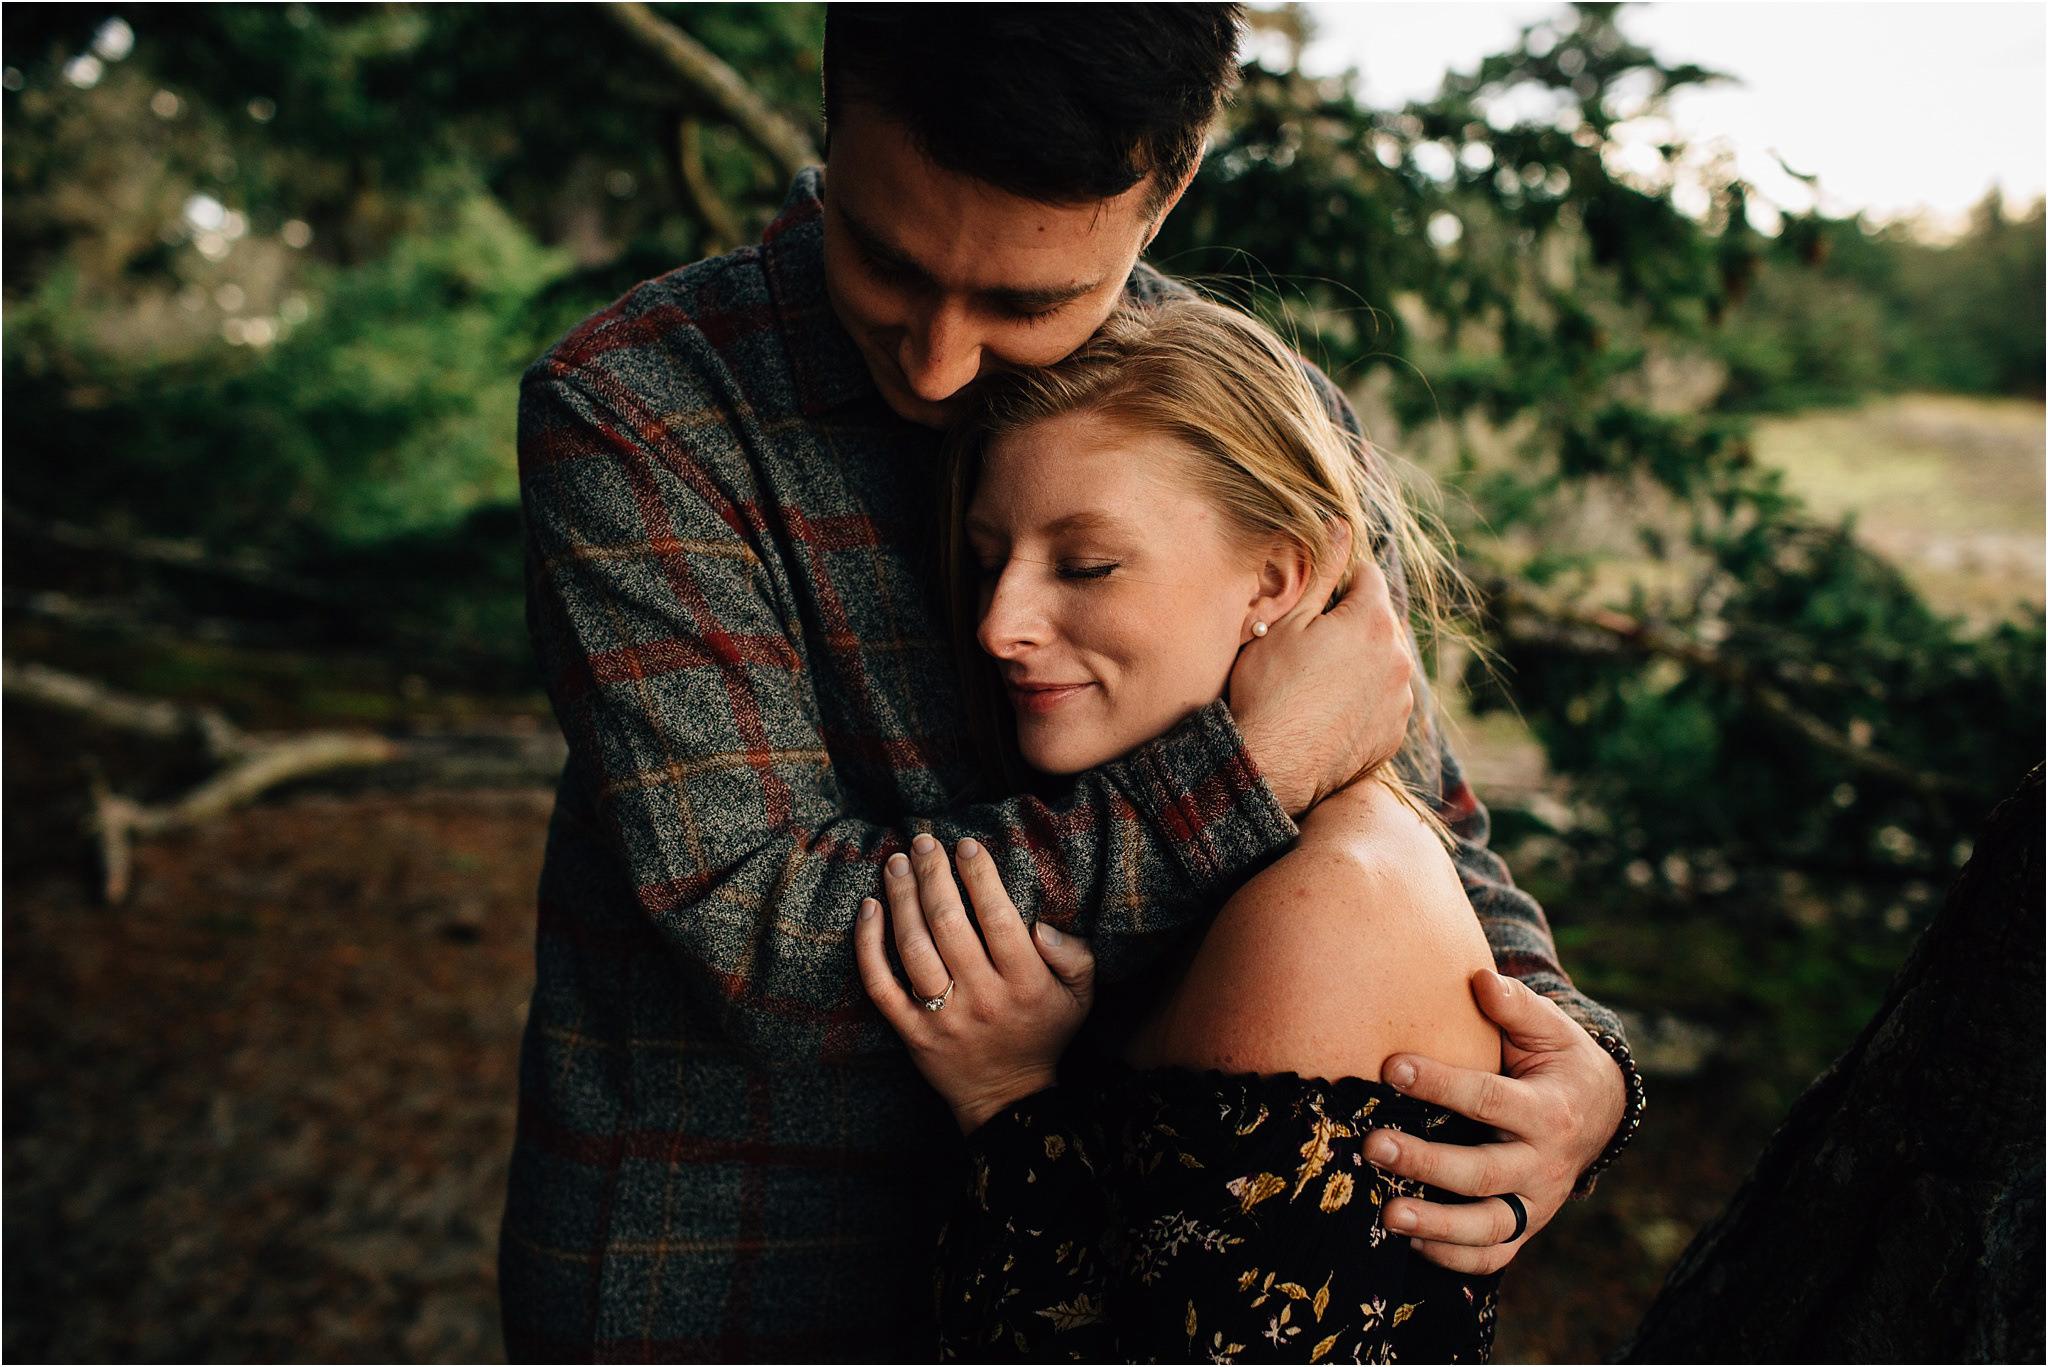 oak-harbor-couples-photographer-deception-pass-13.jpg